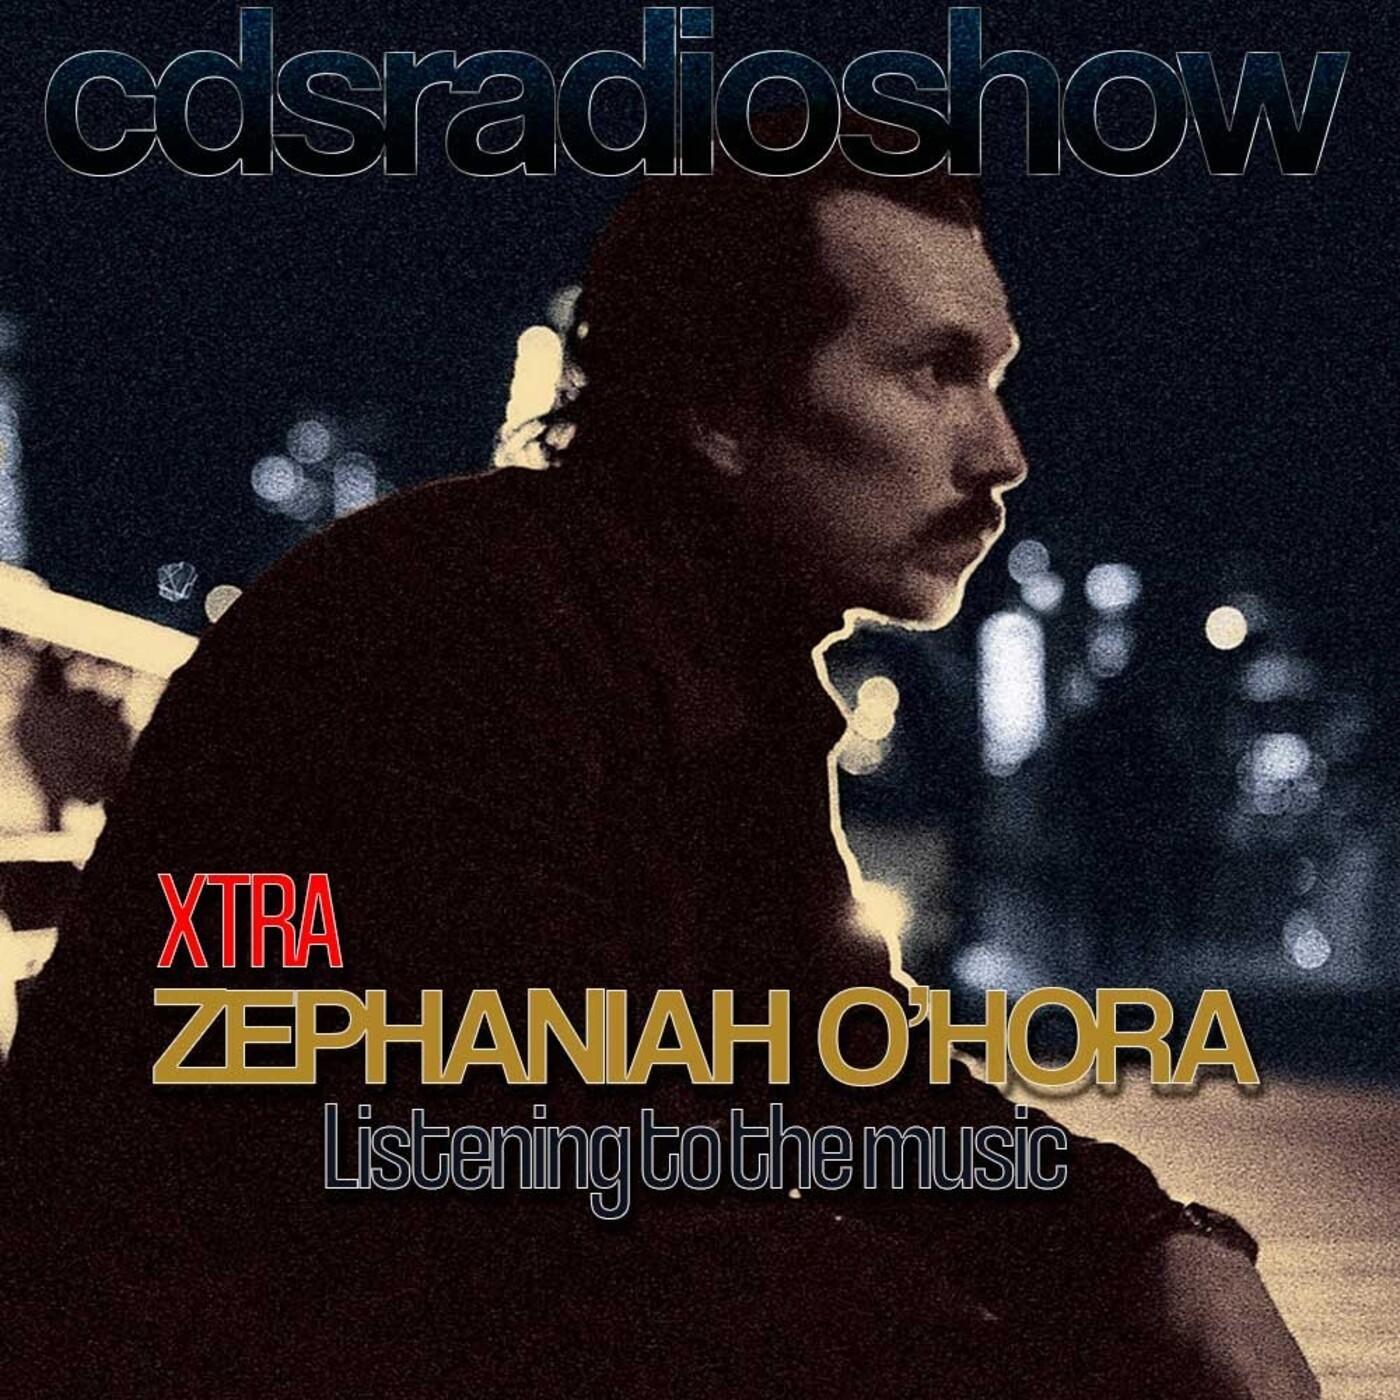 Xtra Zephania O'Hora 'Listening to the music'